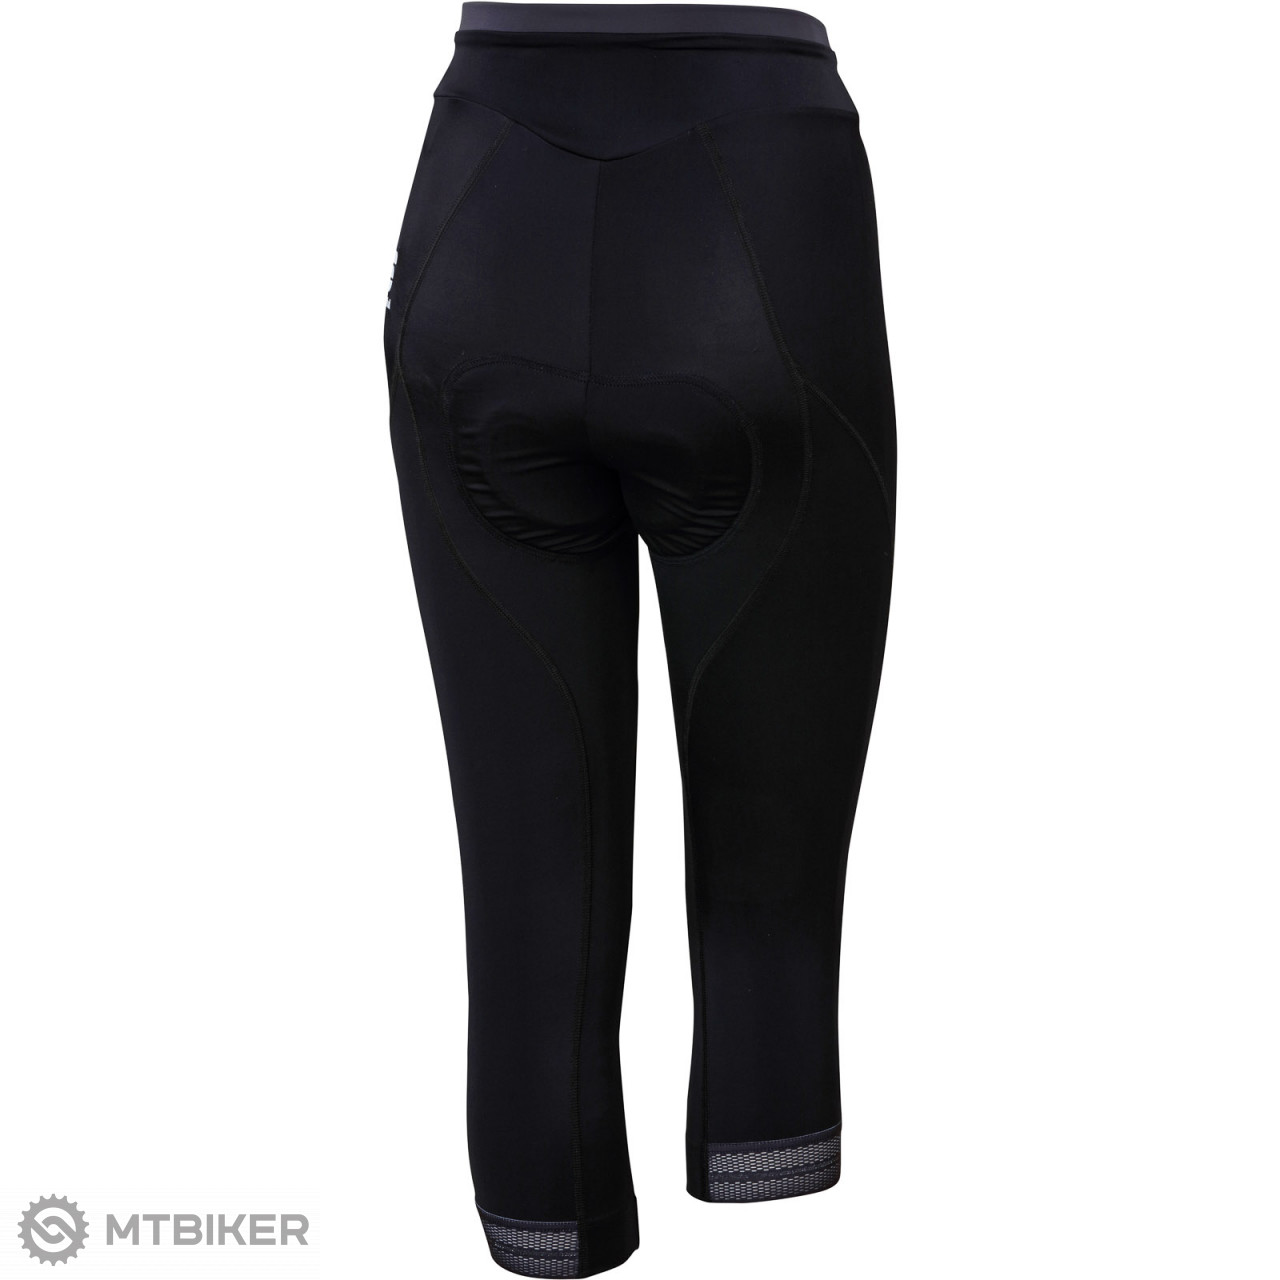 704788cbd6c5 Sportful Giro dámske 3 4 nohavice čierne - MTBIKER Shop